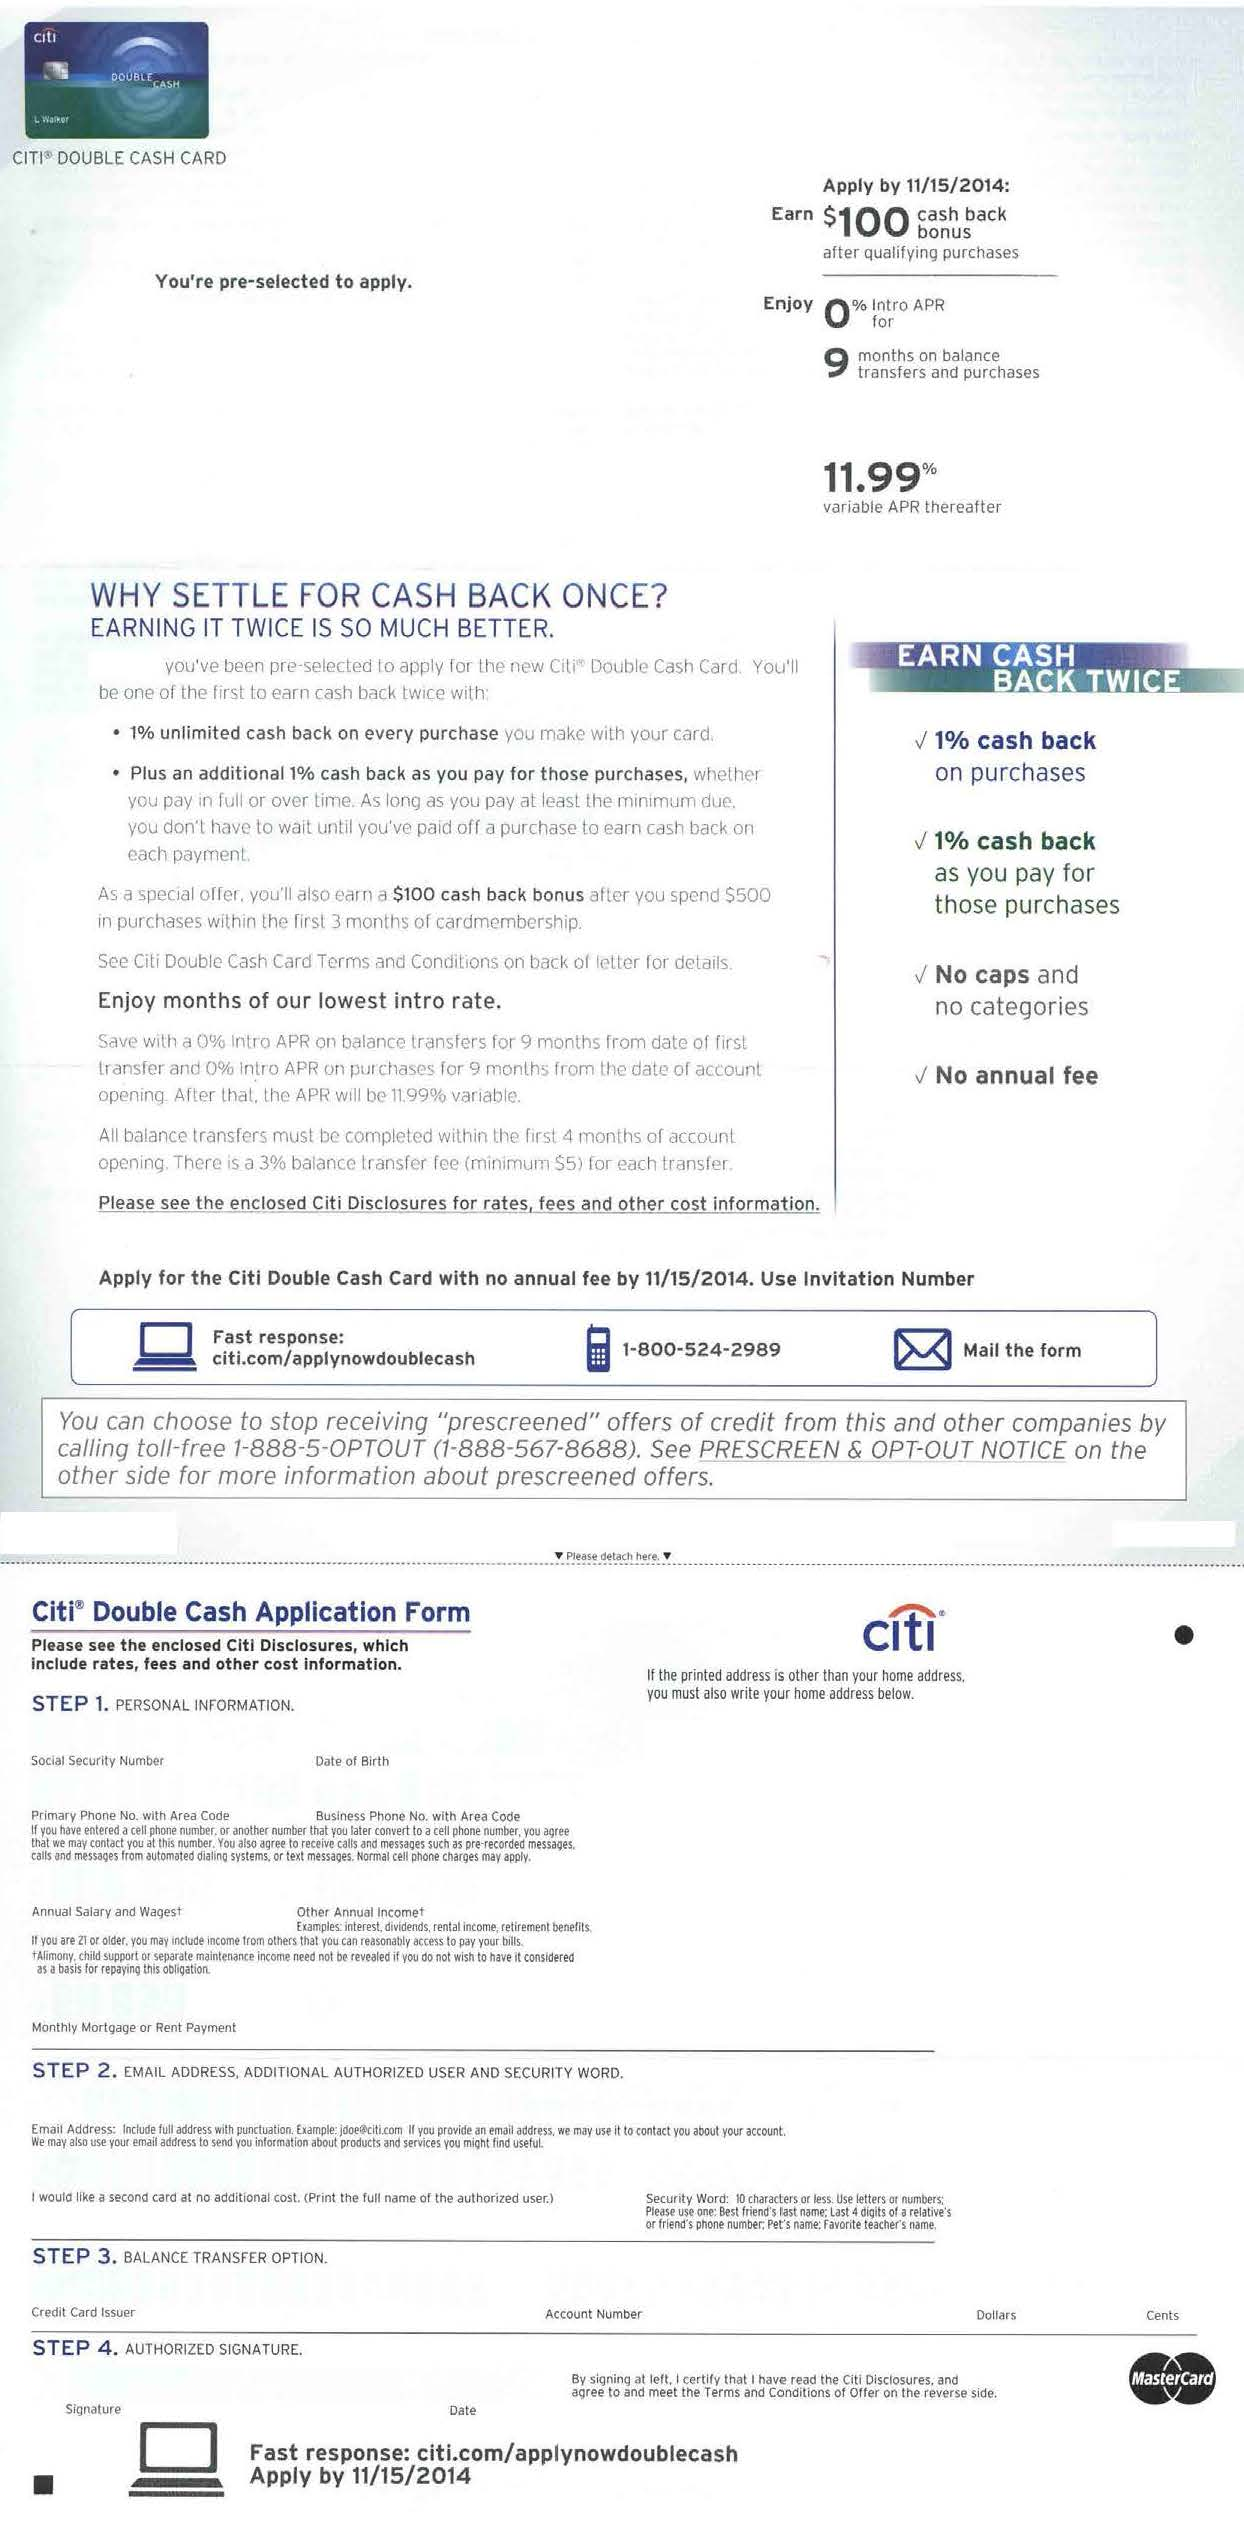 citi double cash back credit card DM 02